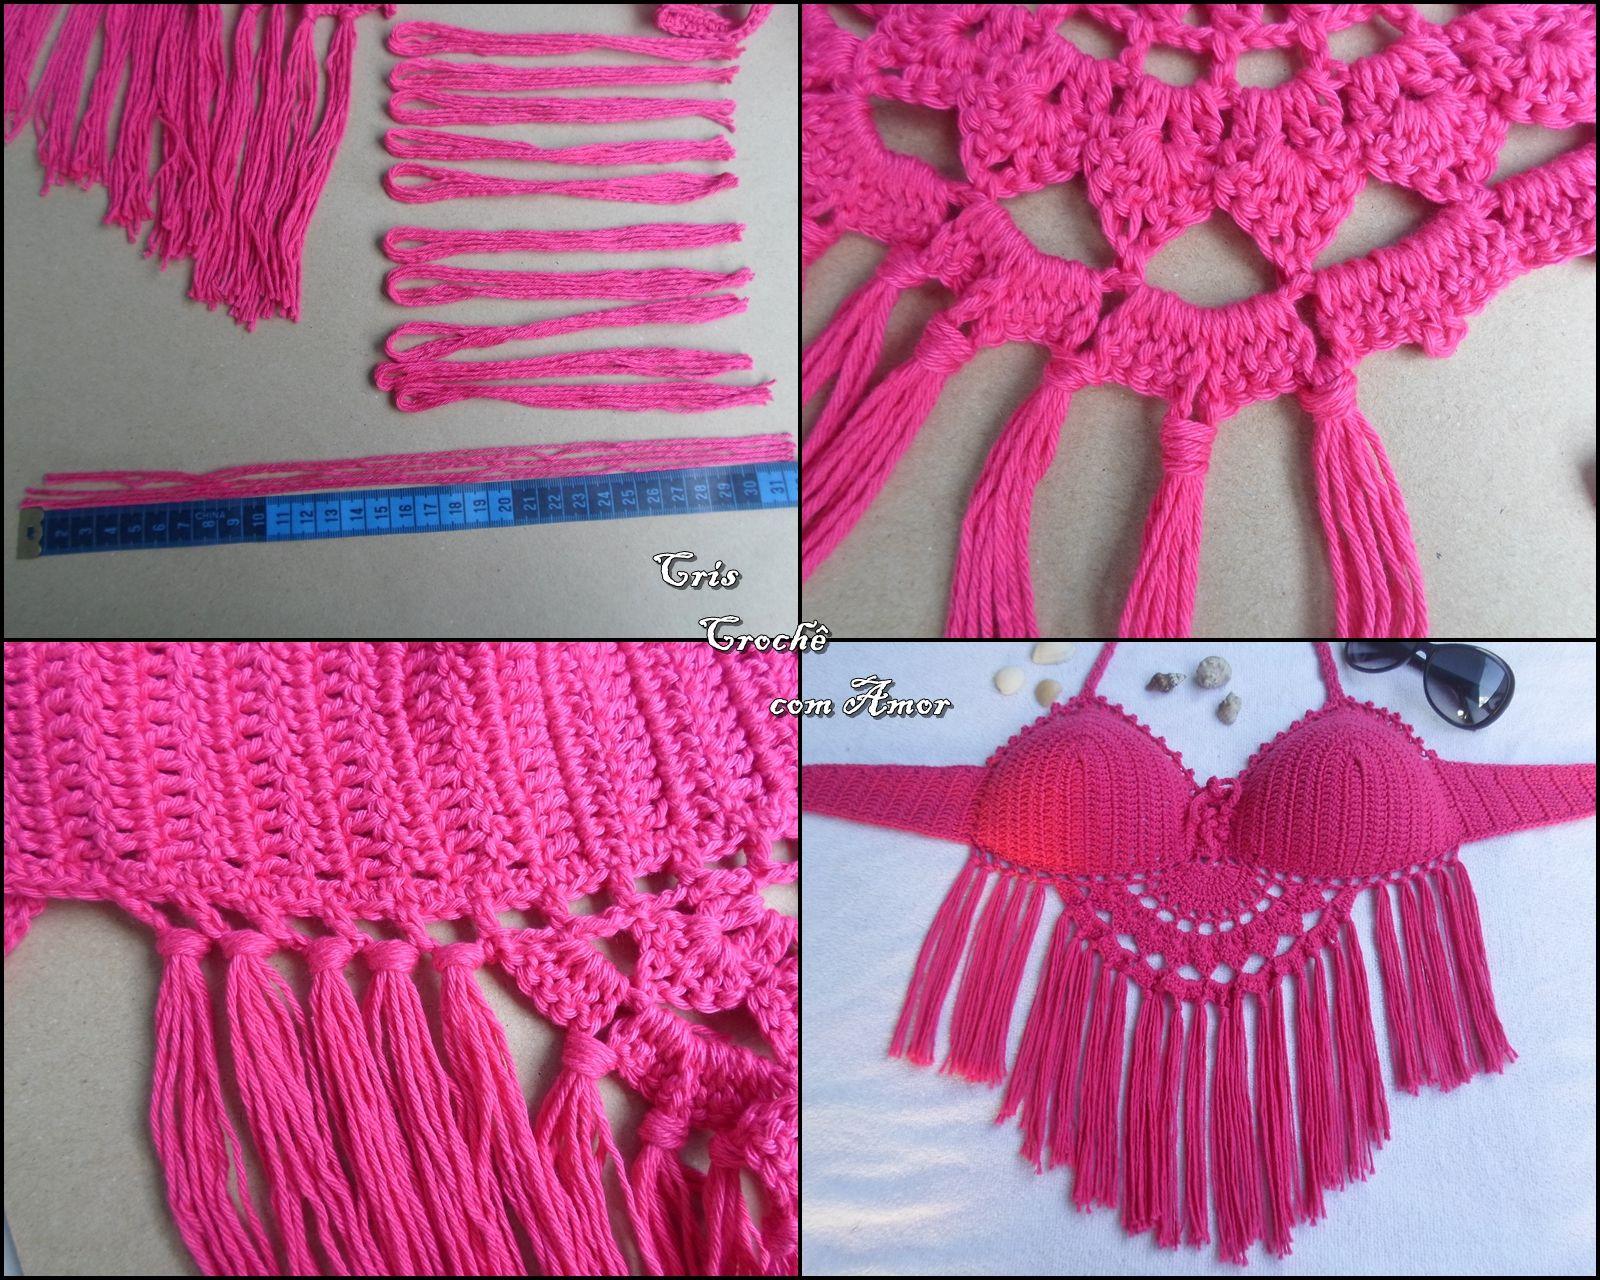 Pin von Hiền Thục auf Bikini Crochet | Pinterest | Bikini